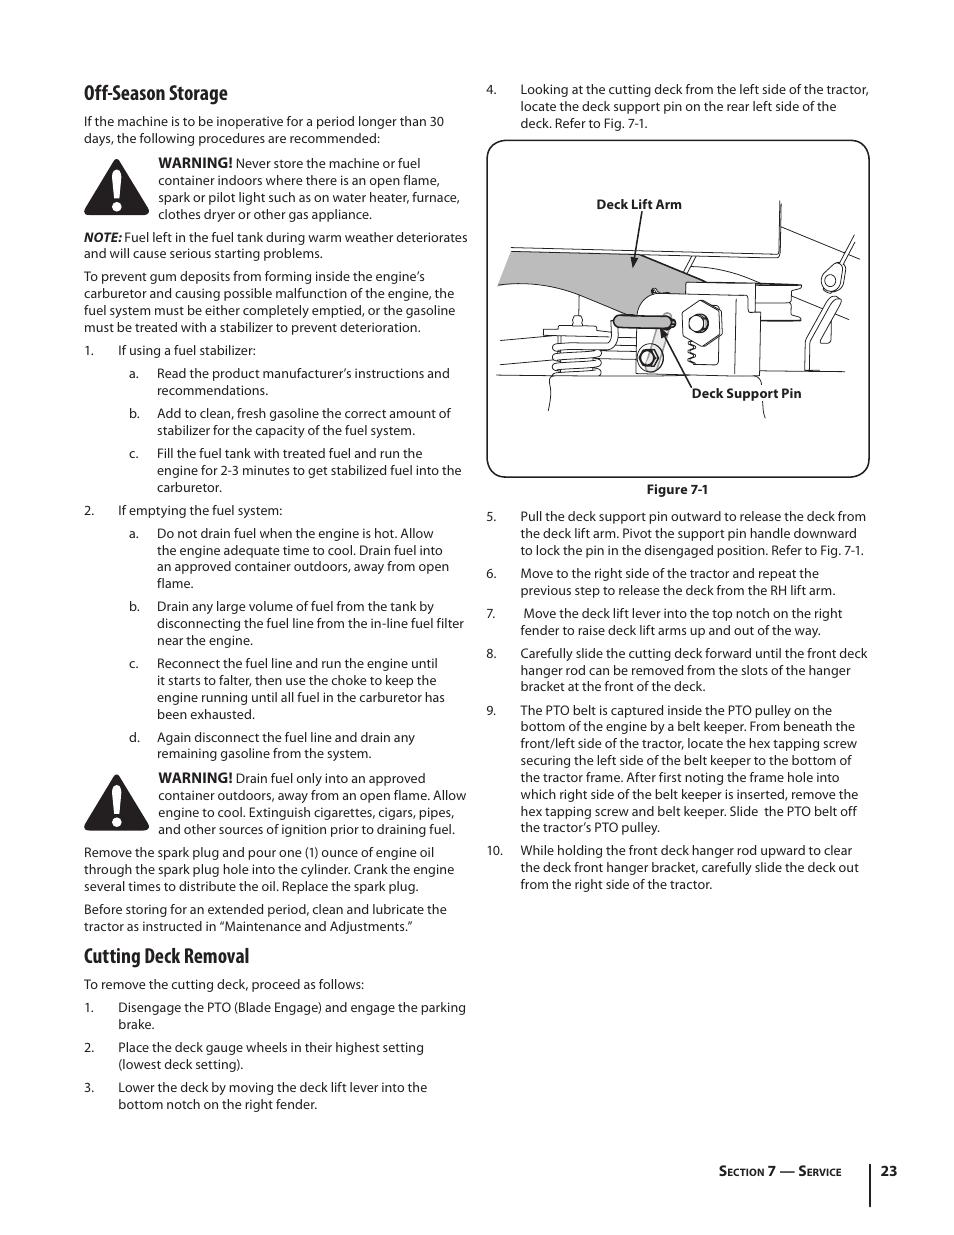 Chevy Impala Radio Wiring Diagram Moreover Kindergarten Worksheets